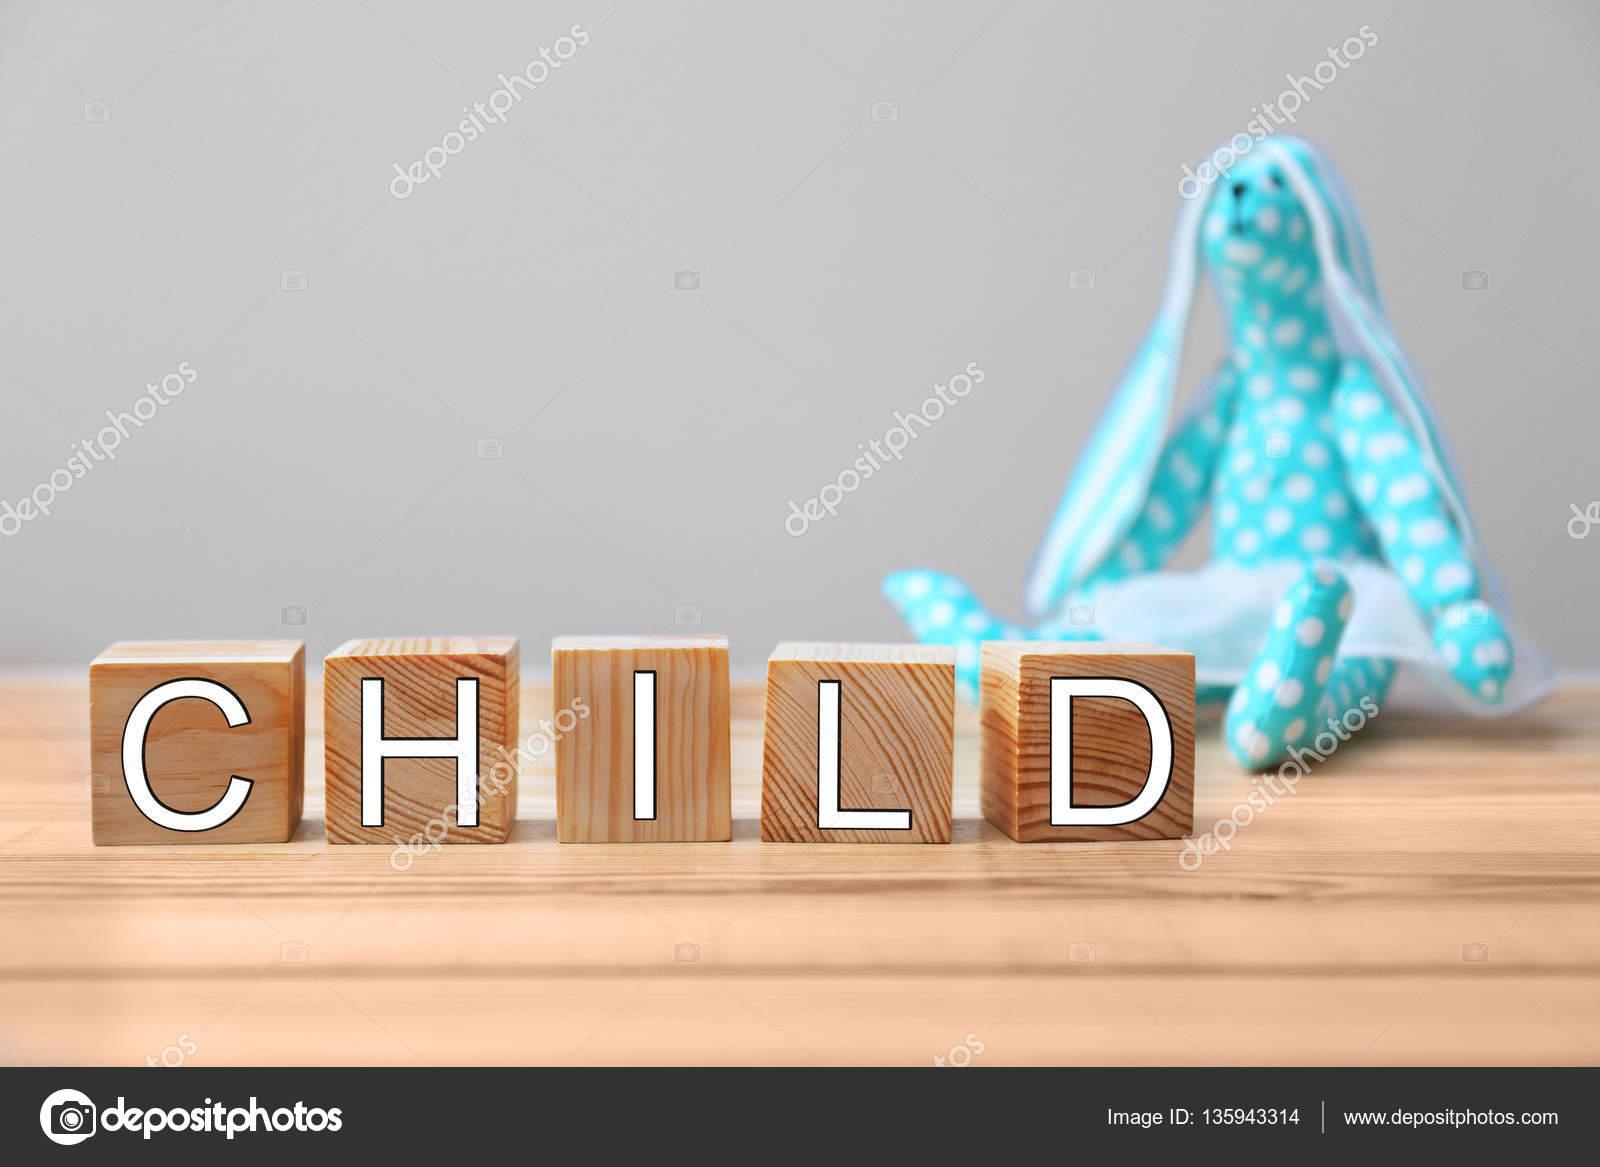 Kast Houten Kubussen : Houten kubussen en speelgoed haas u2014 stockfoto © belchonock #135943314